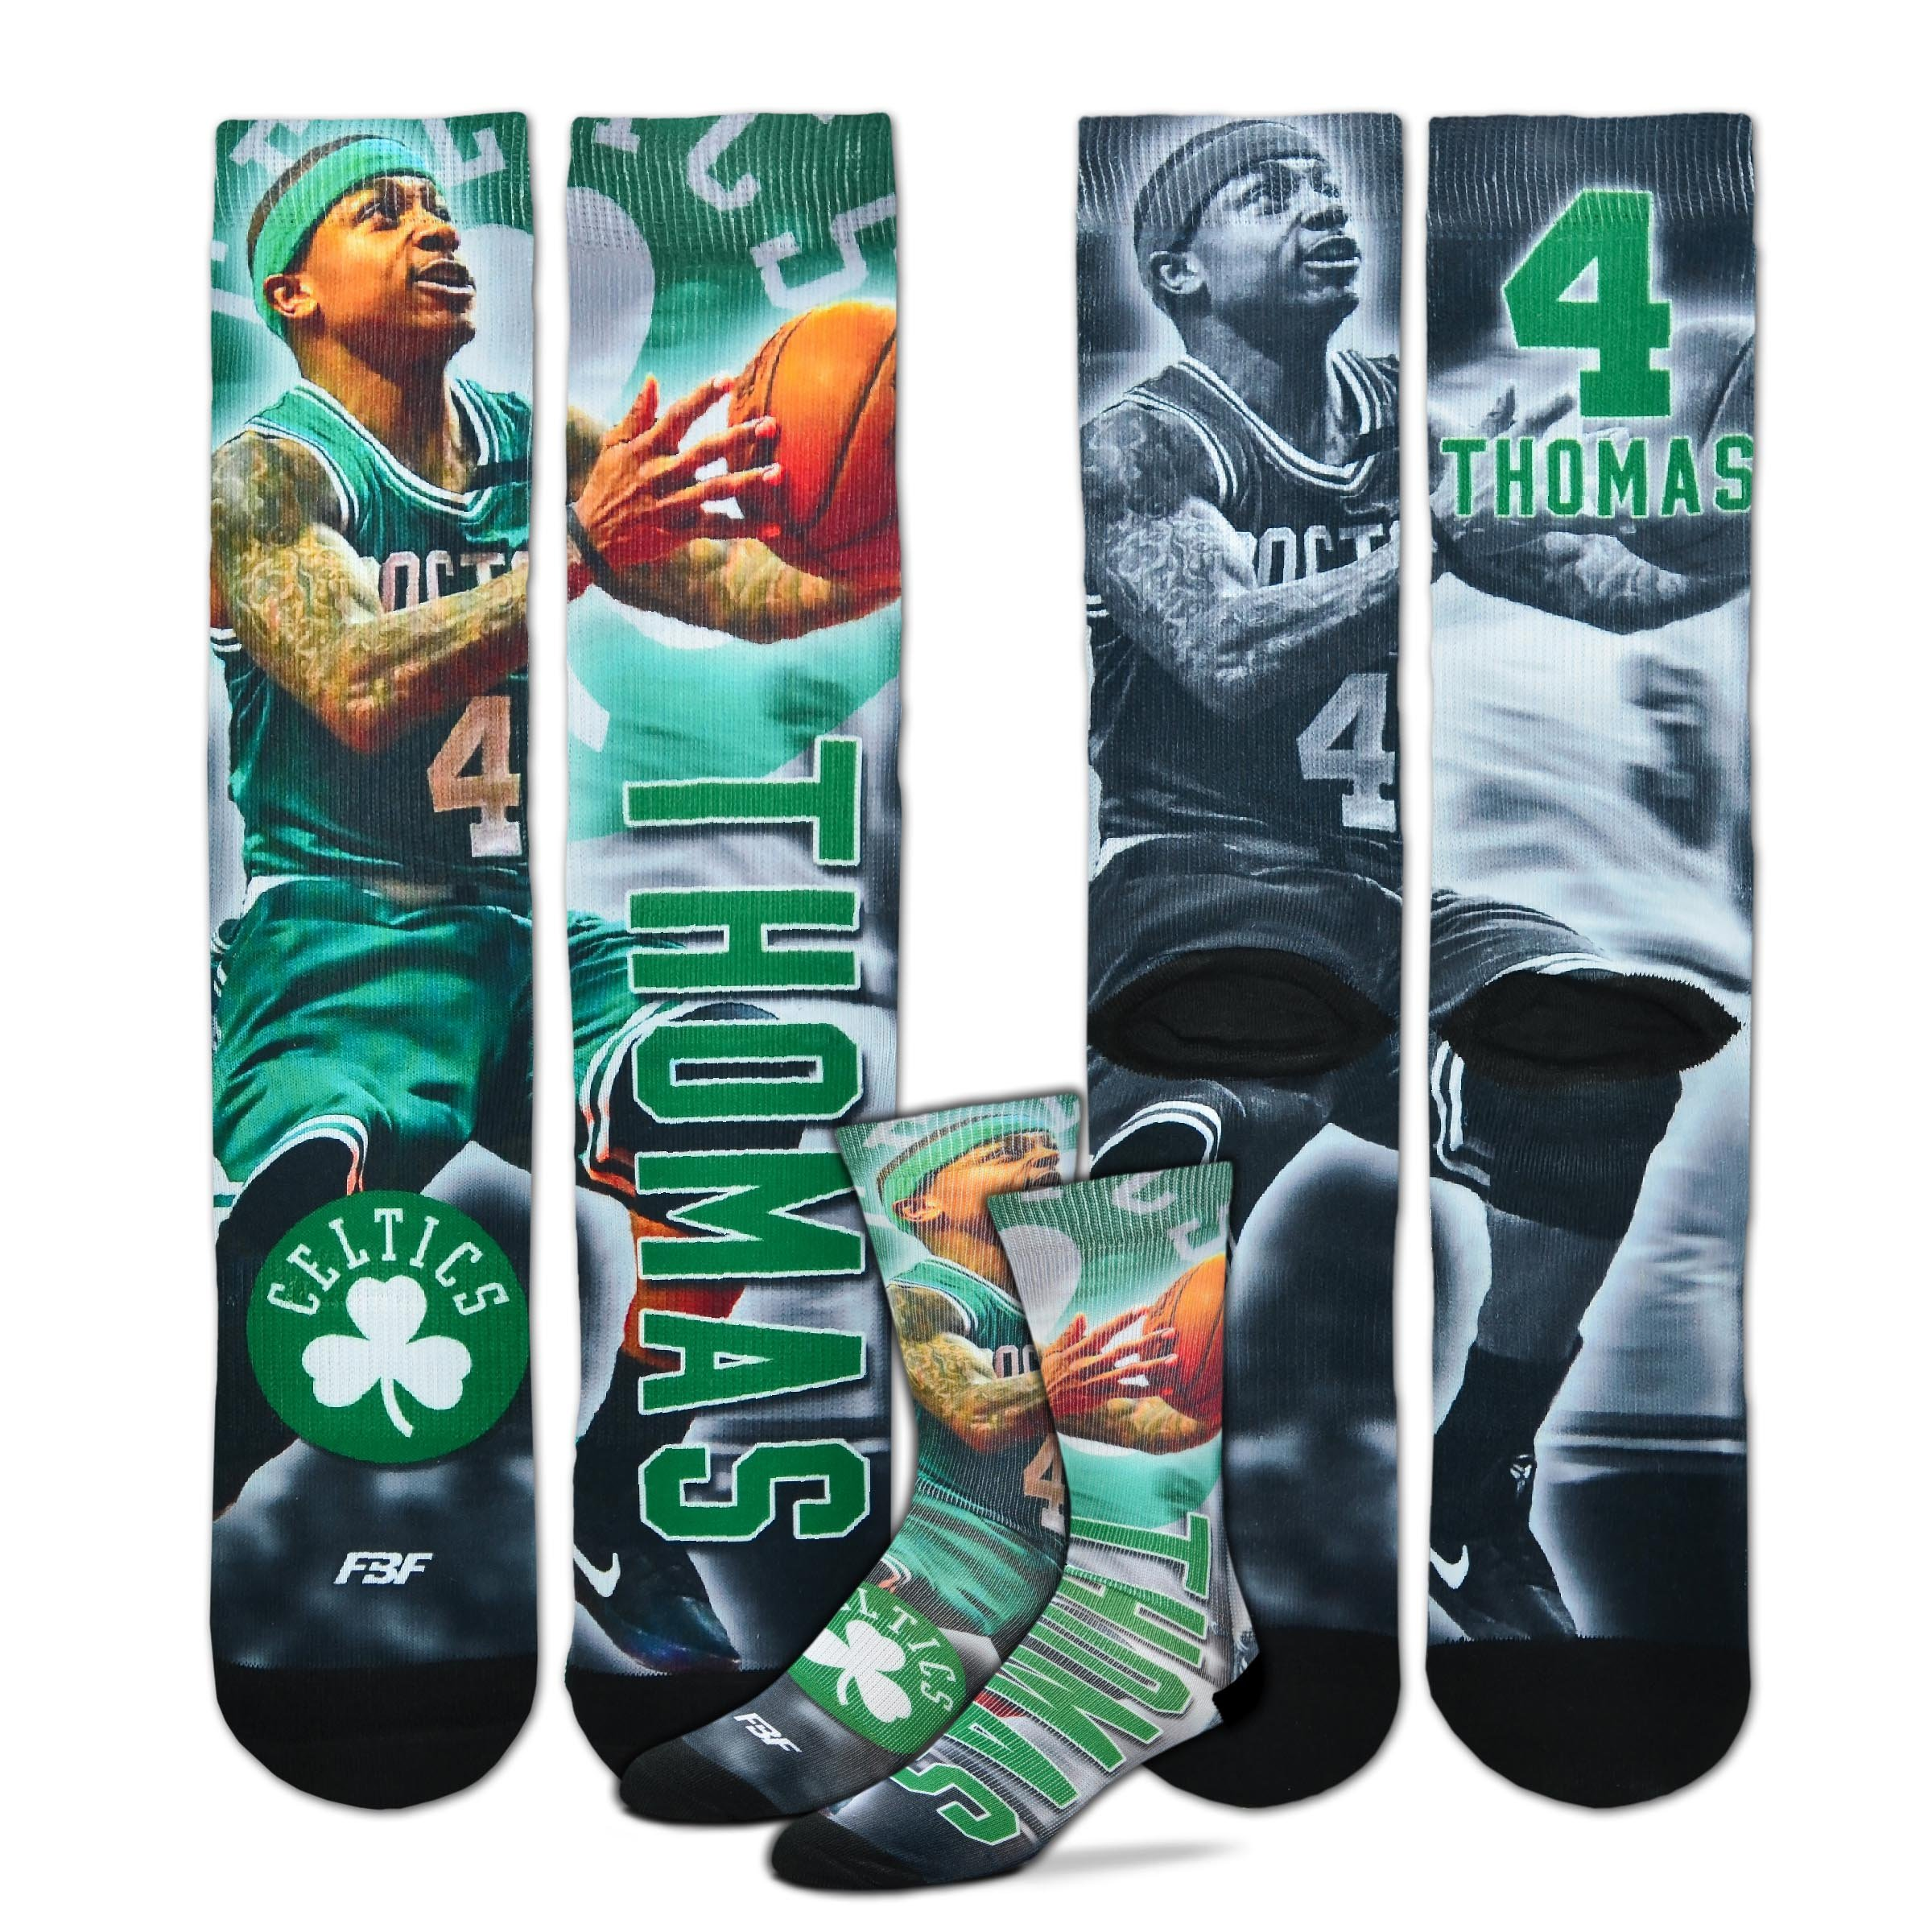 Isaiah Thomas Boston Celtics NBA Drive Crew Socks Men's Size Medium 5-10 by For Bare Feet